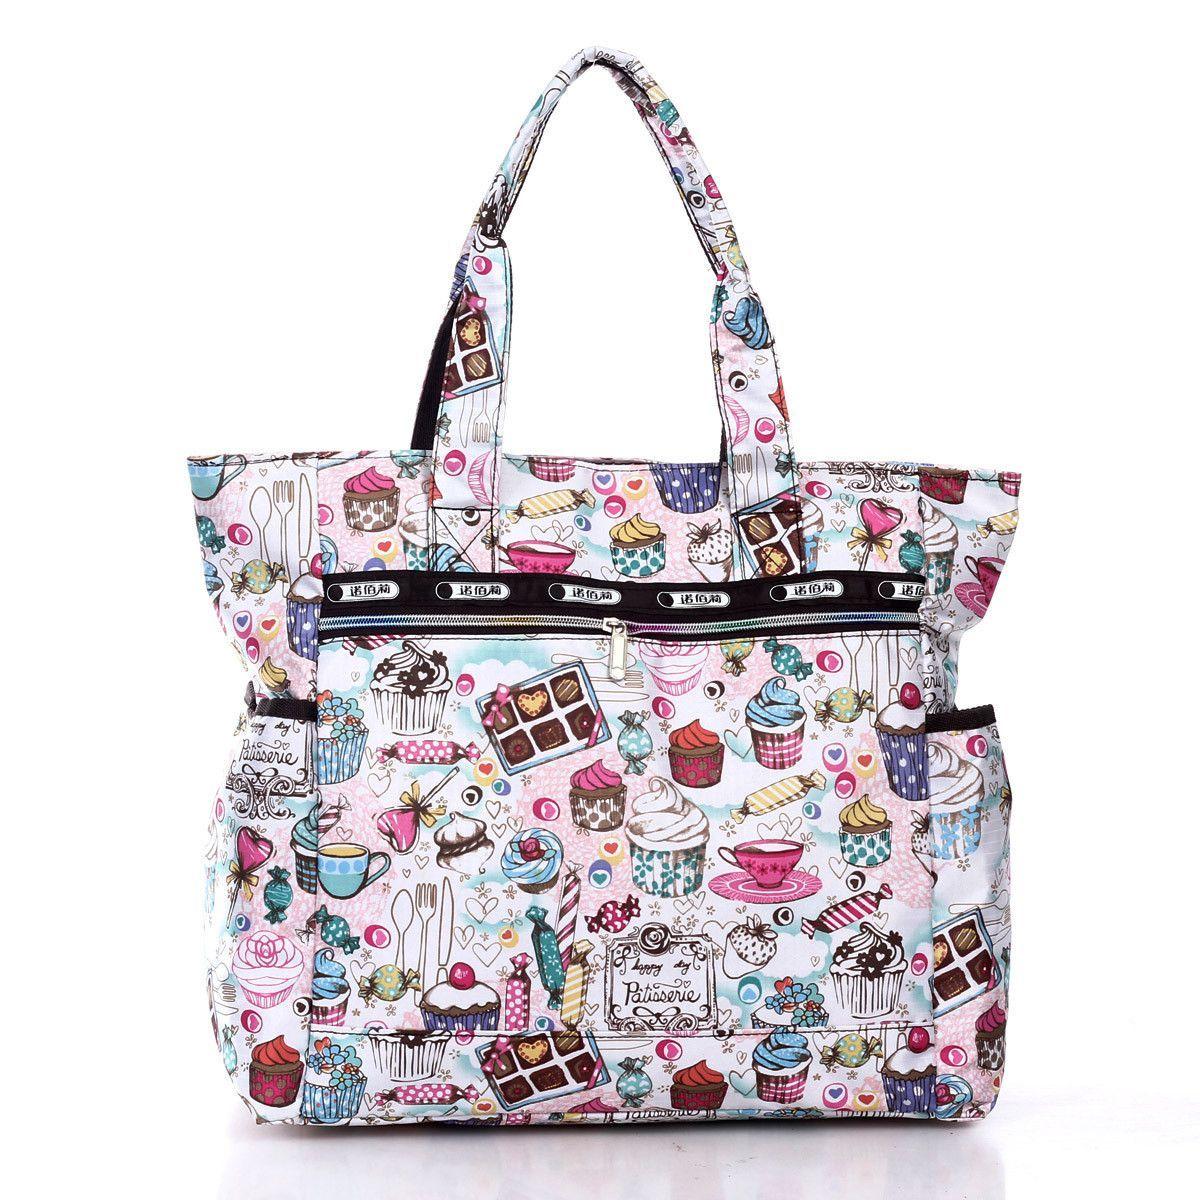 Women Handbag Fashion Bolsos Mujer Lesport Style Big Messenger Bags Sac Mummy Bag Ladies Tote Bag Female Summer Beach Bag N80-2